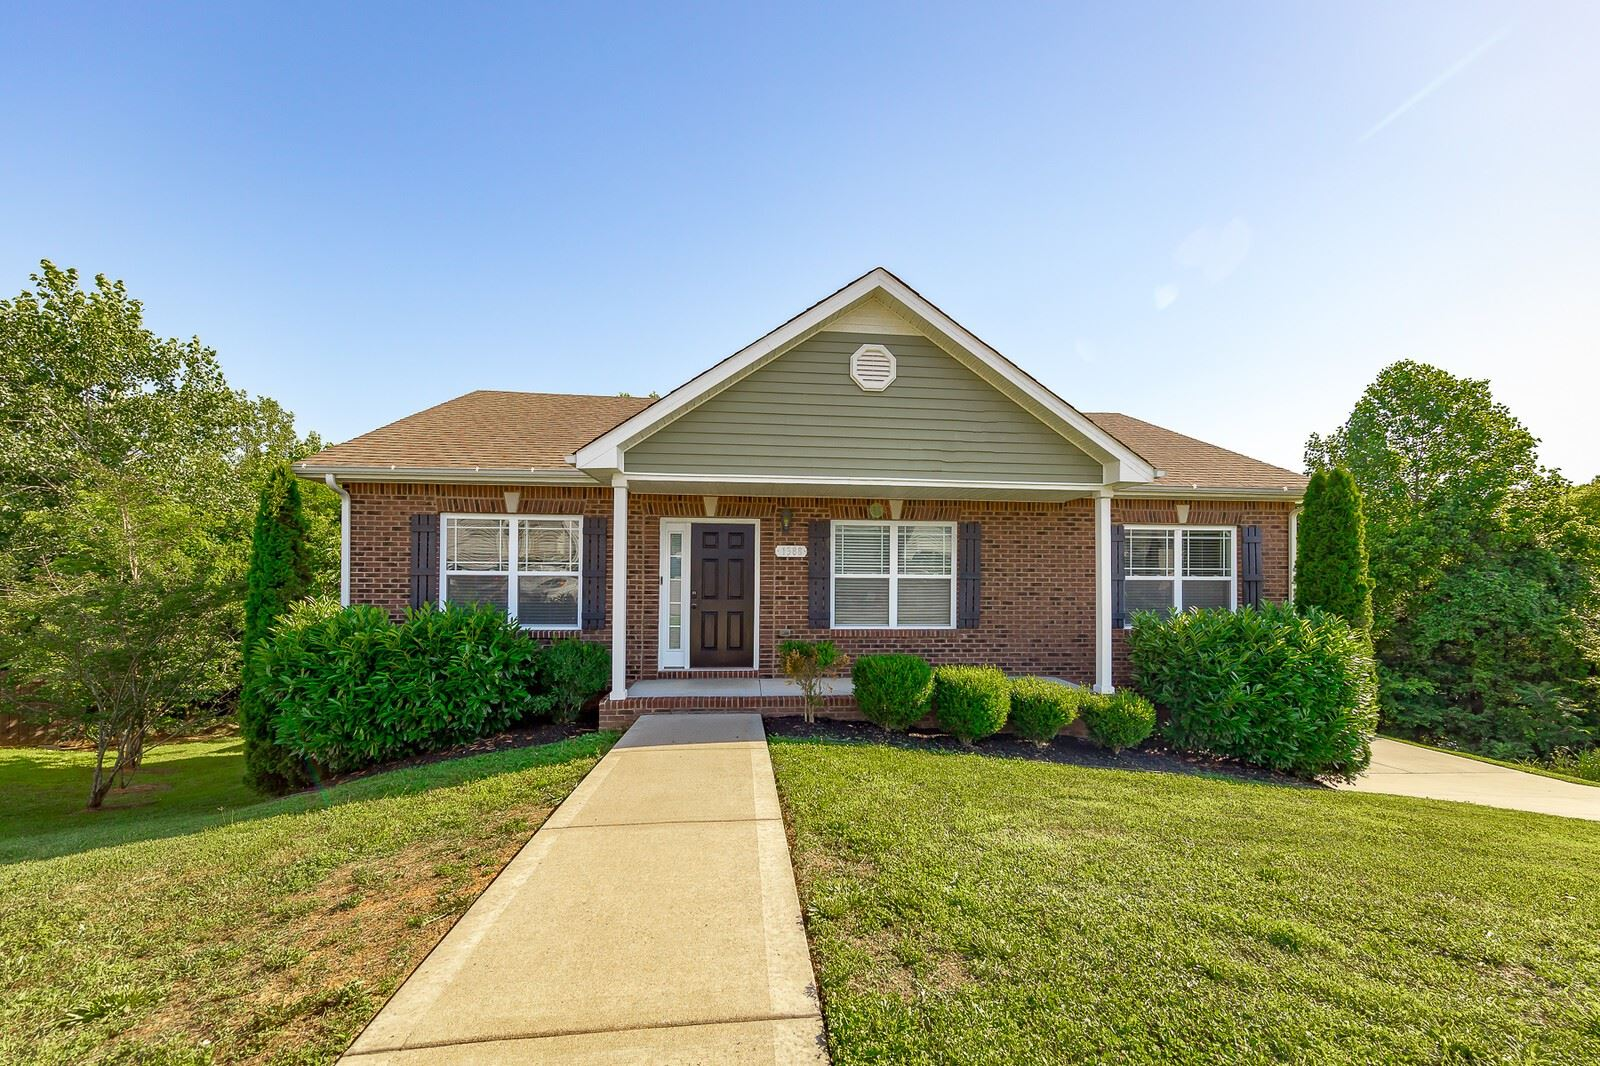 1388 Shady Hill Ct, Clarksville, TN 37042 - MLS#: 2262873